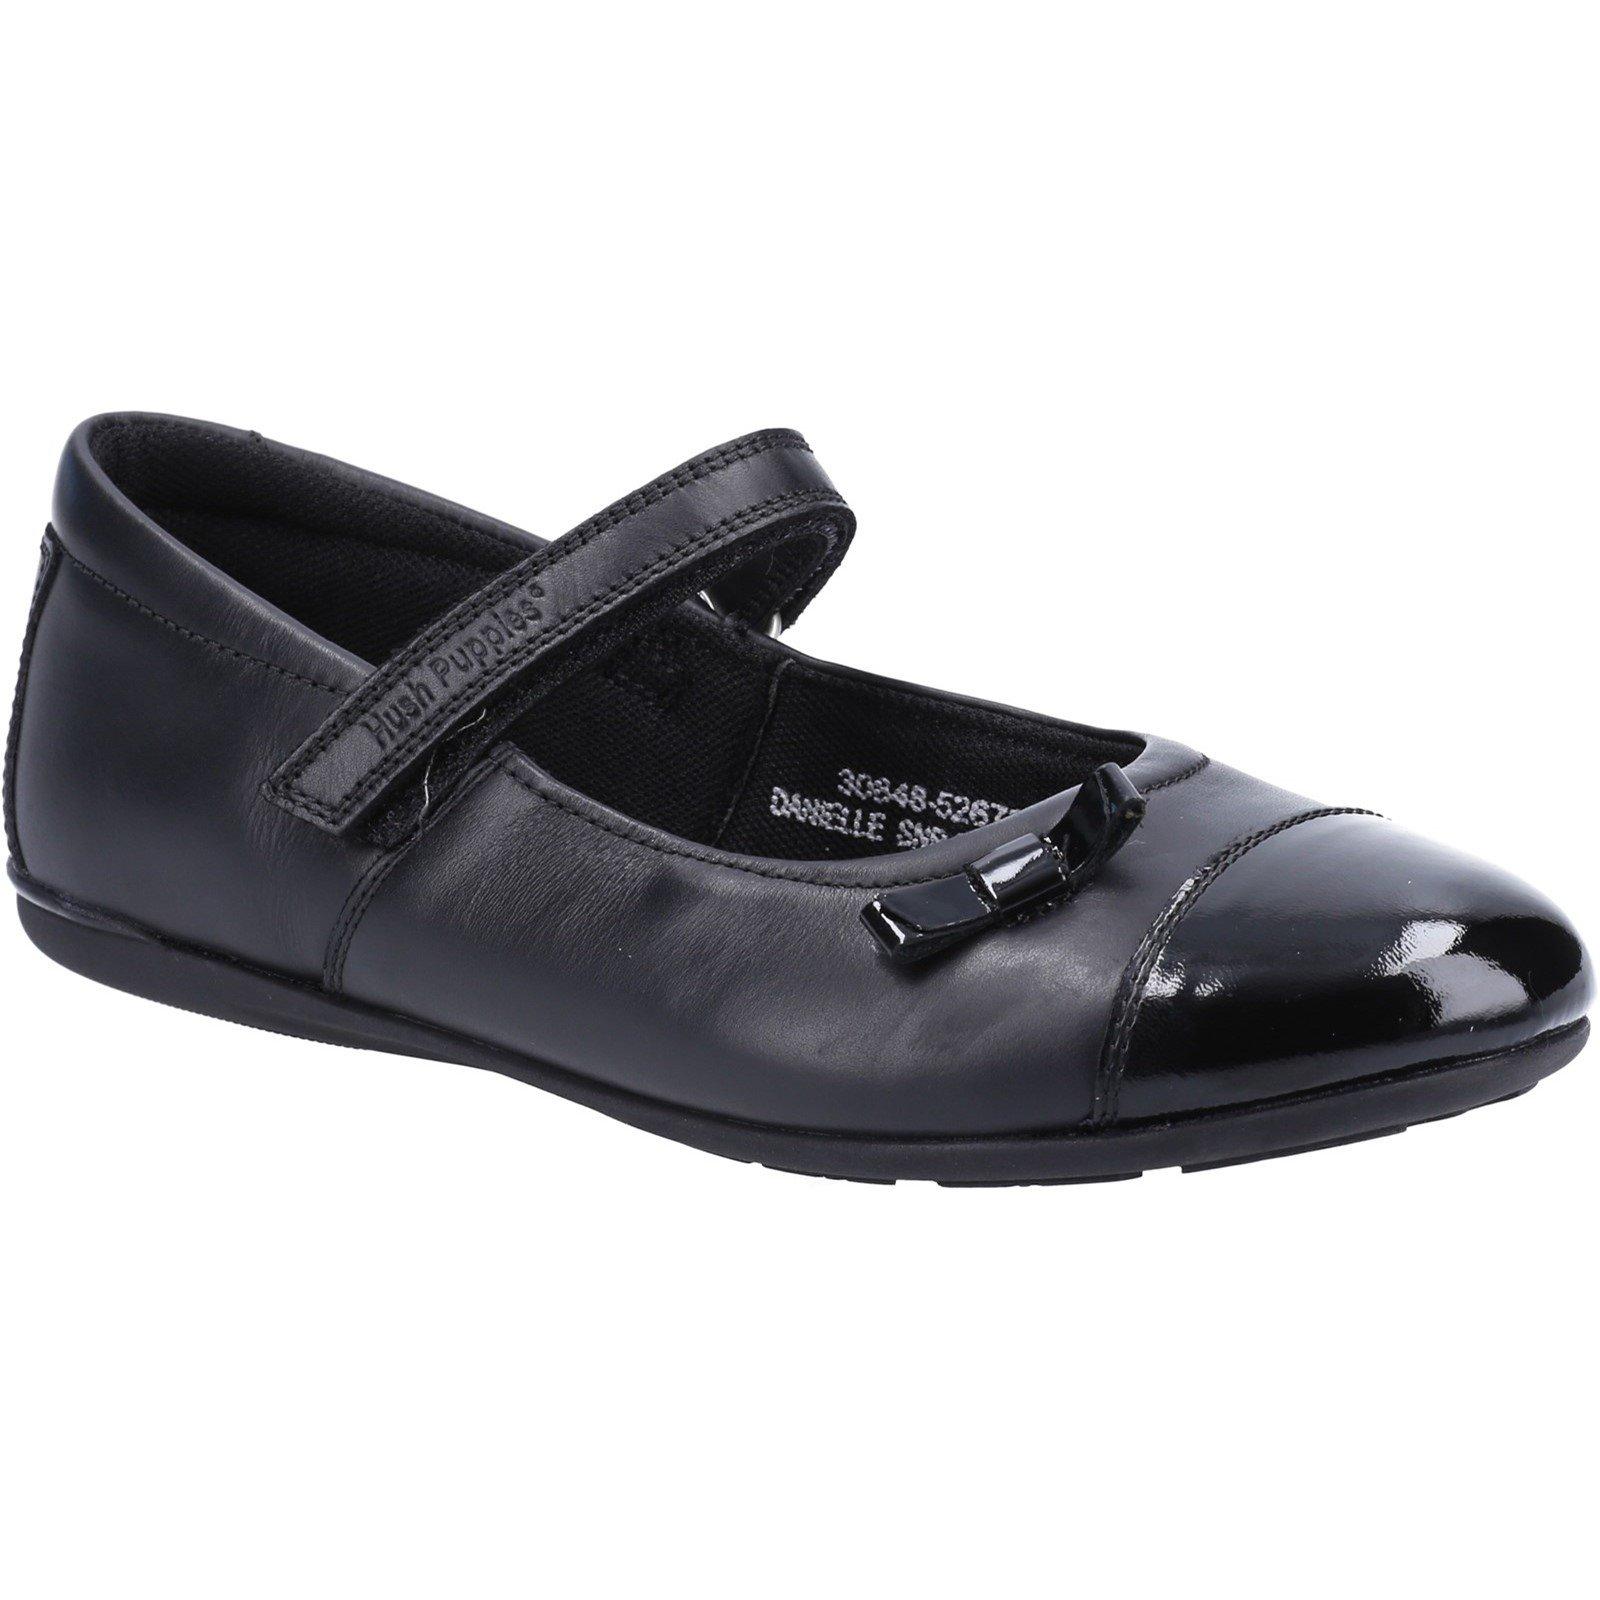 Hush Puppies Kid's Danielle Junior School Shoe Black 30847 - Black 10